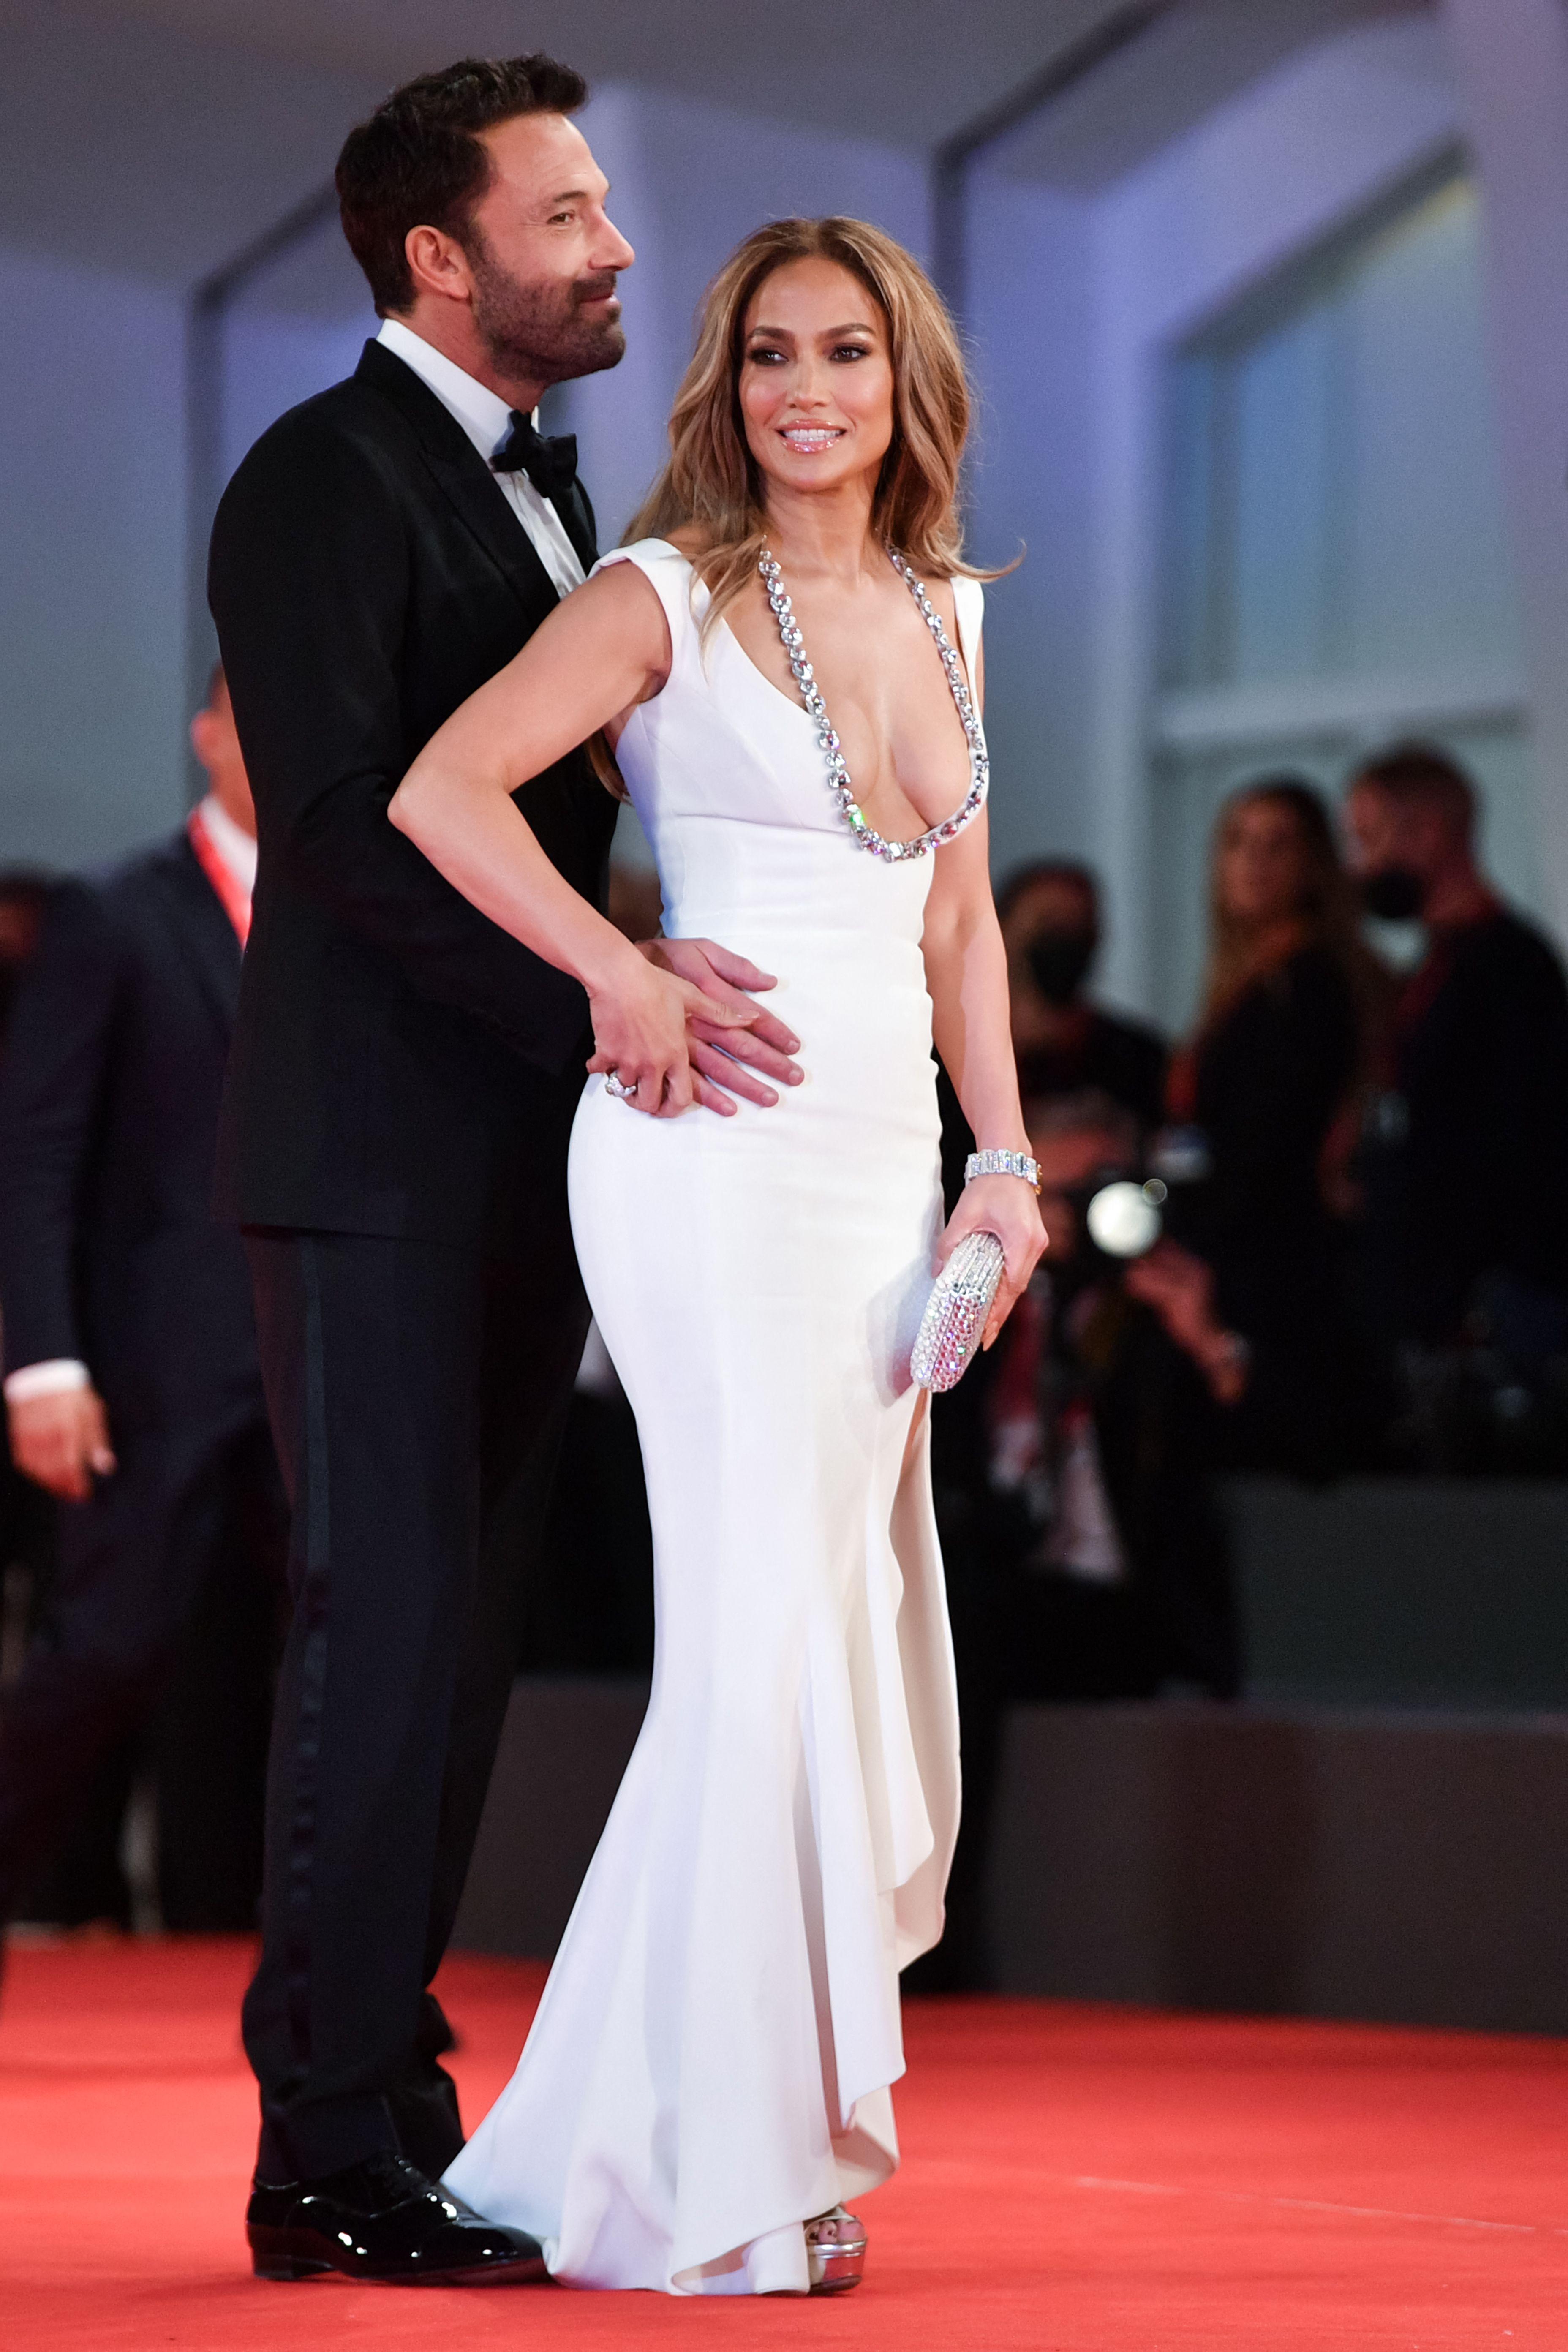 Jennifer Lopez-Ben Affleck Make Their Relationship Official